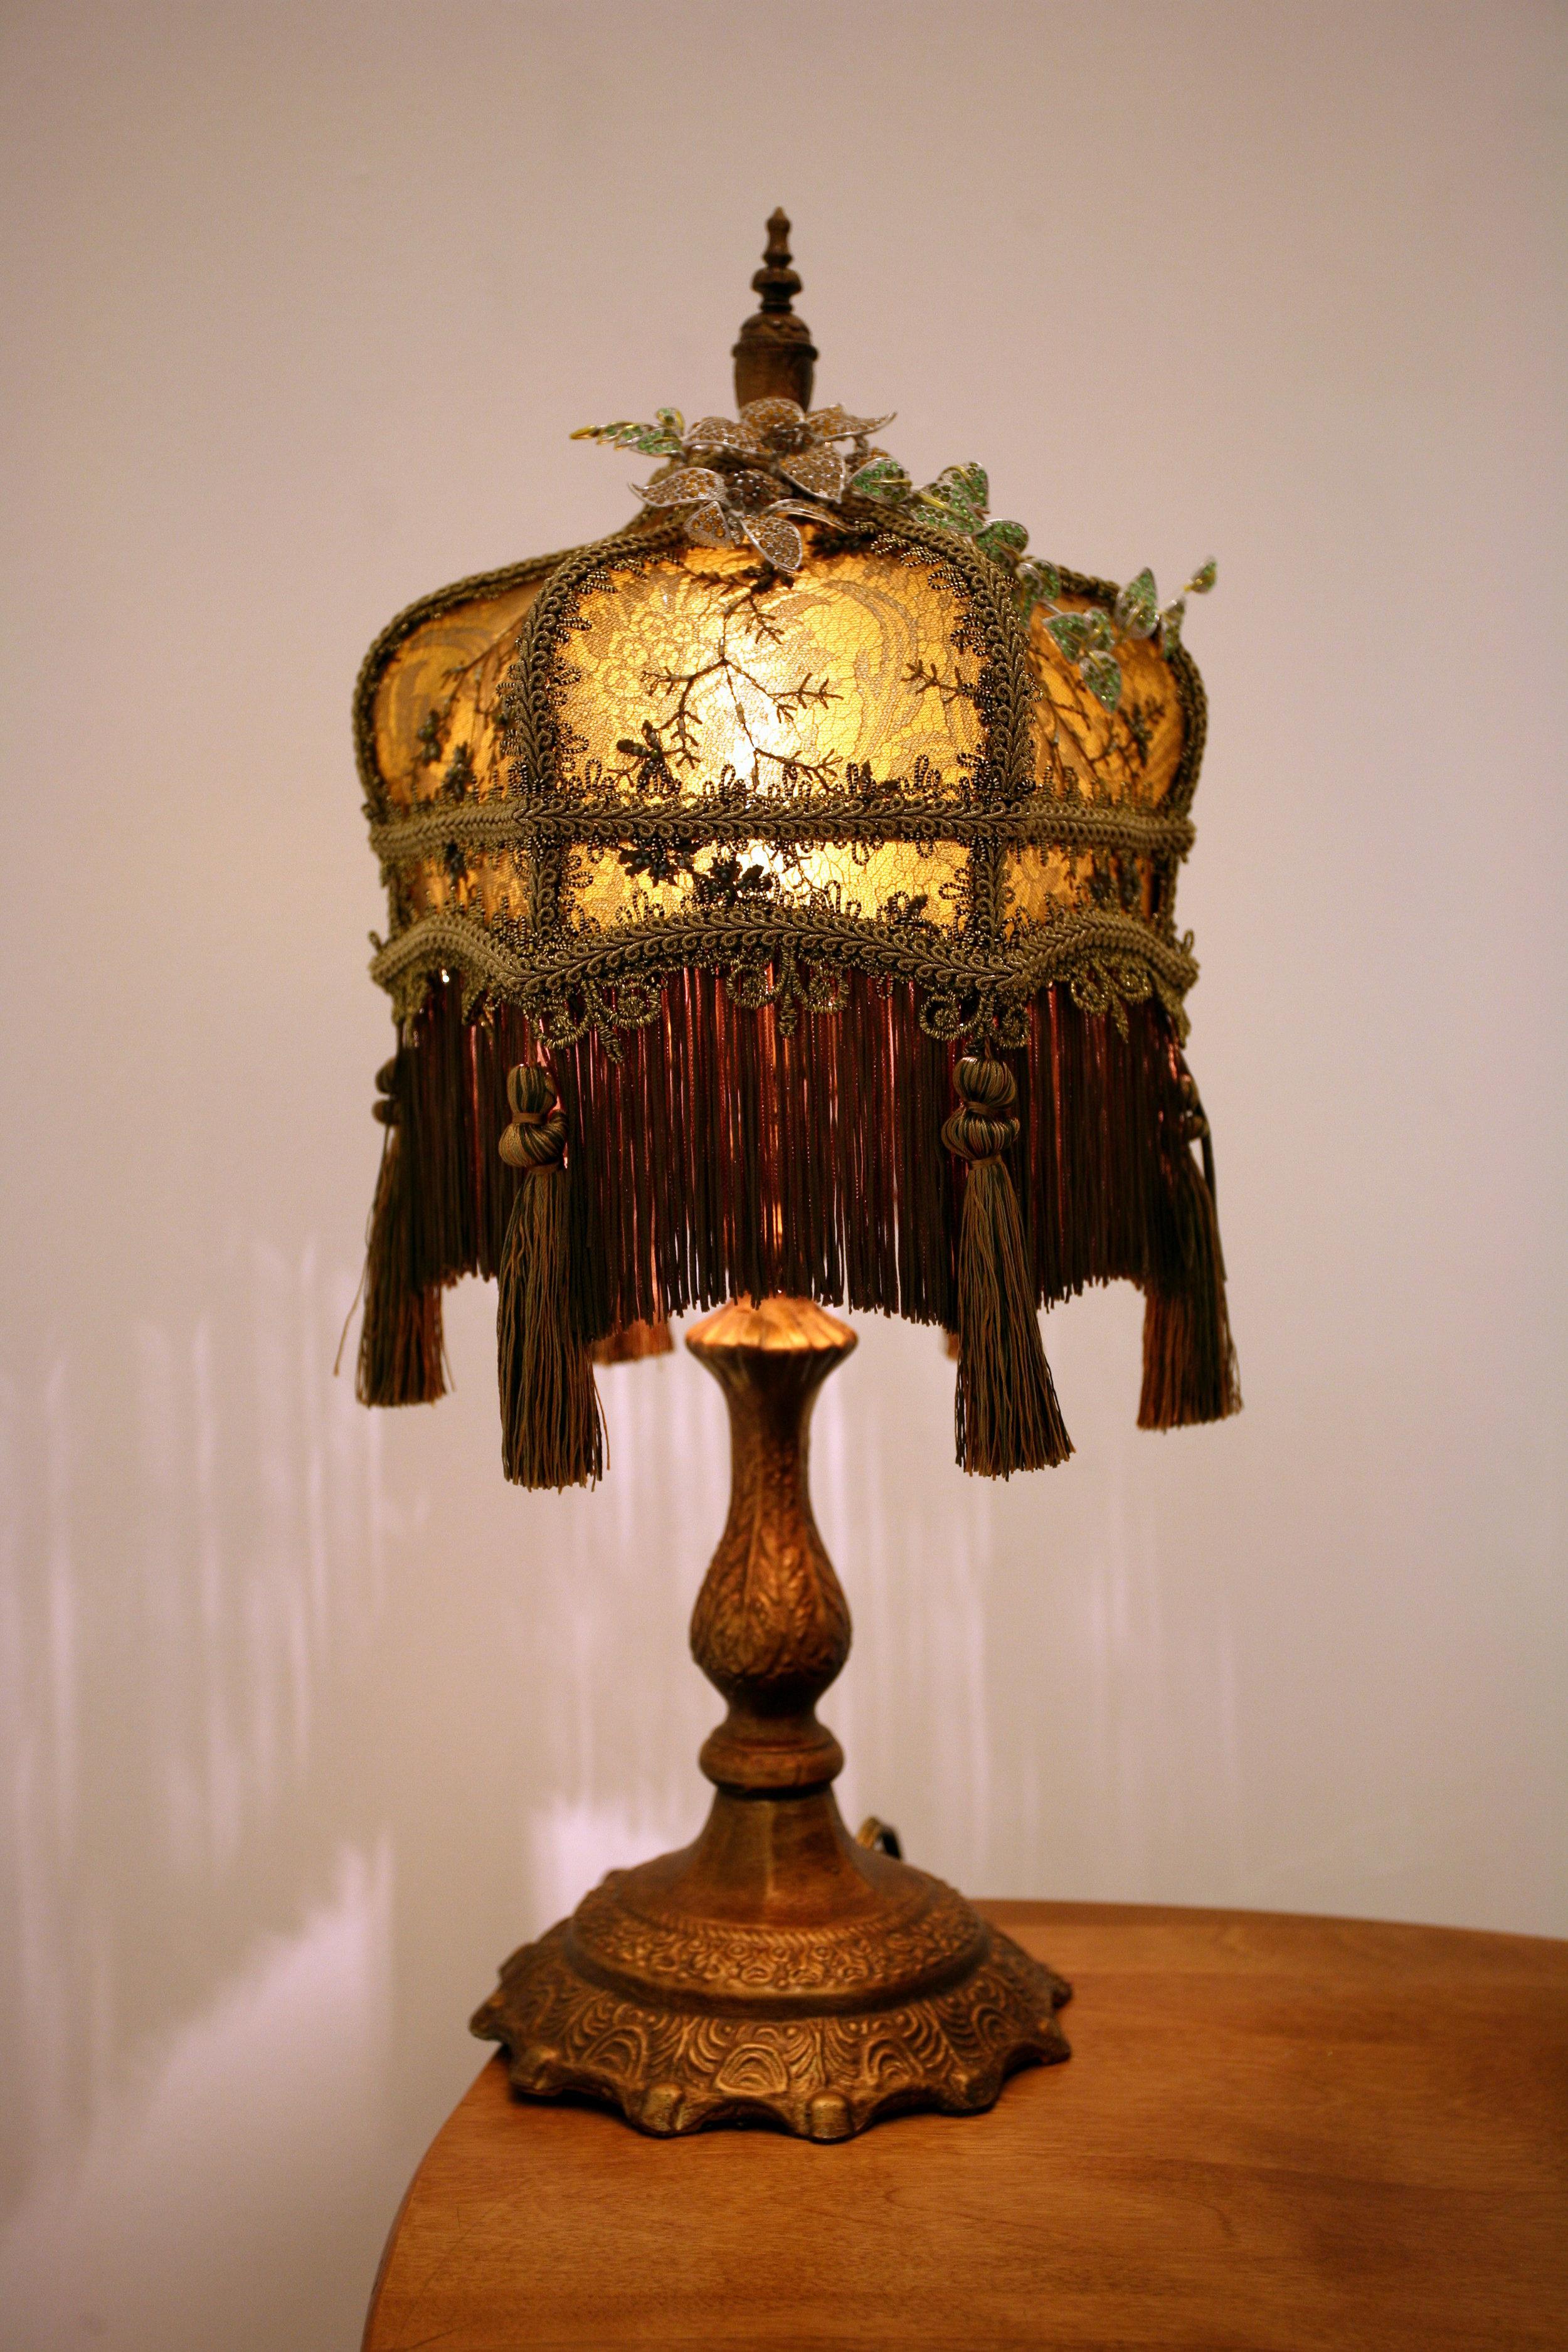 Lamp with custom lamp shade